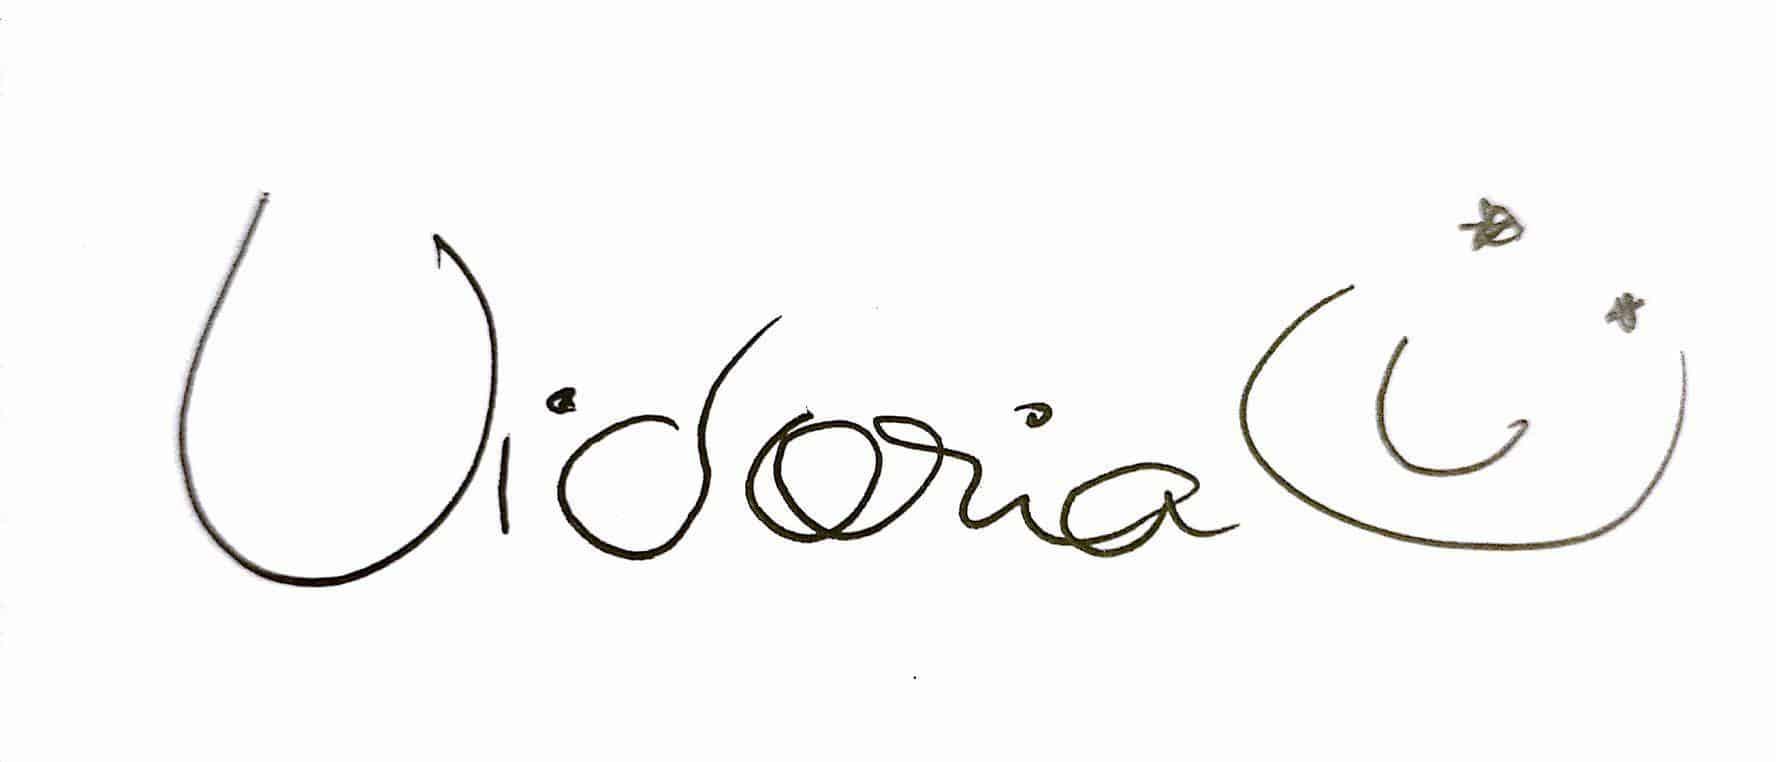 Victoria's signature 2017 - Green Apple Wellness Centre